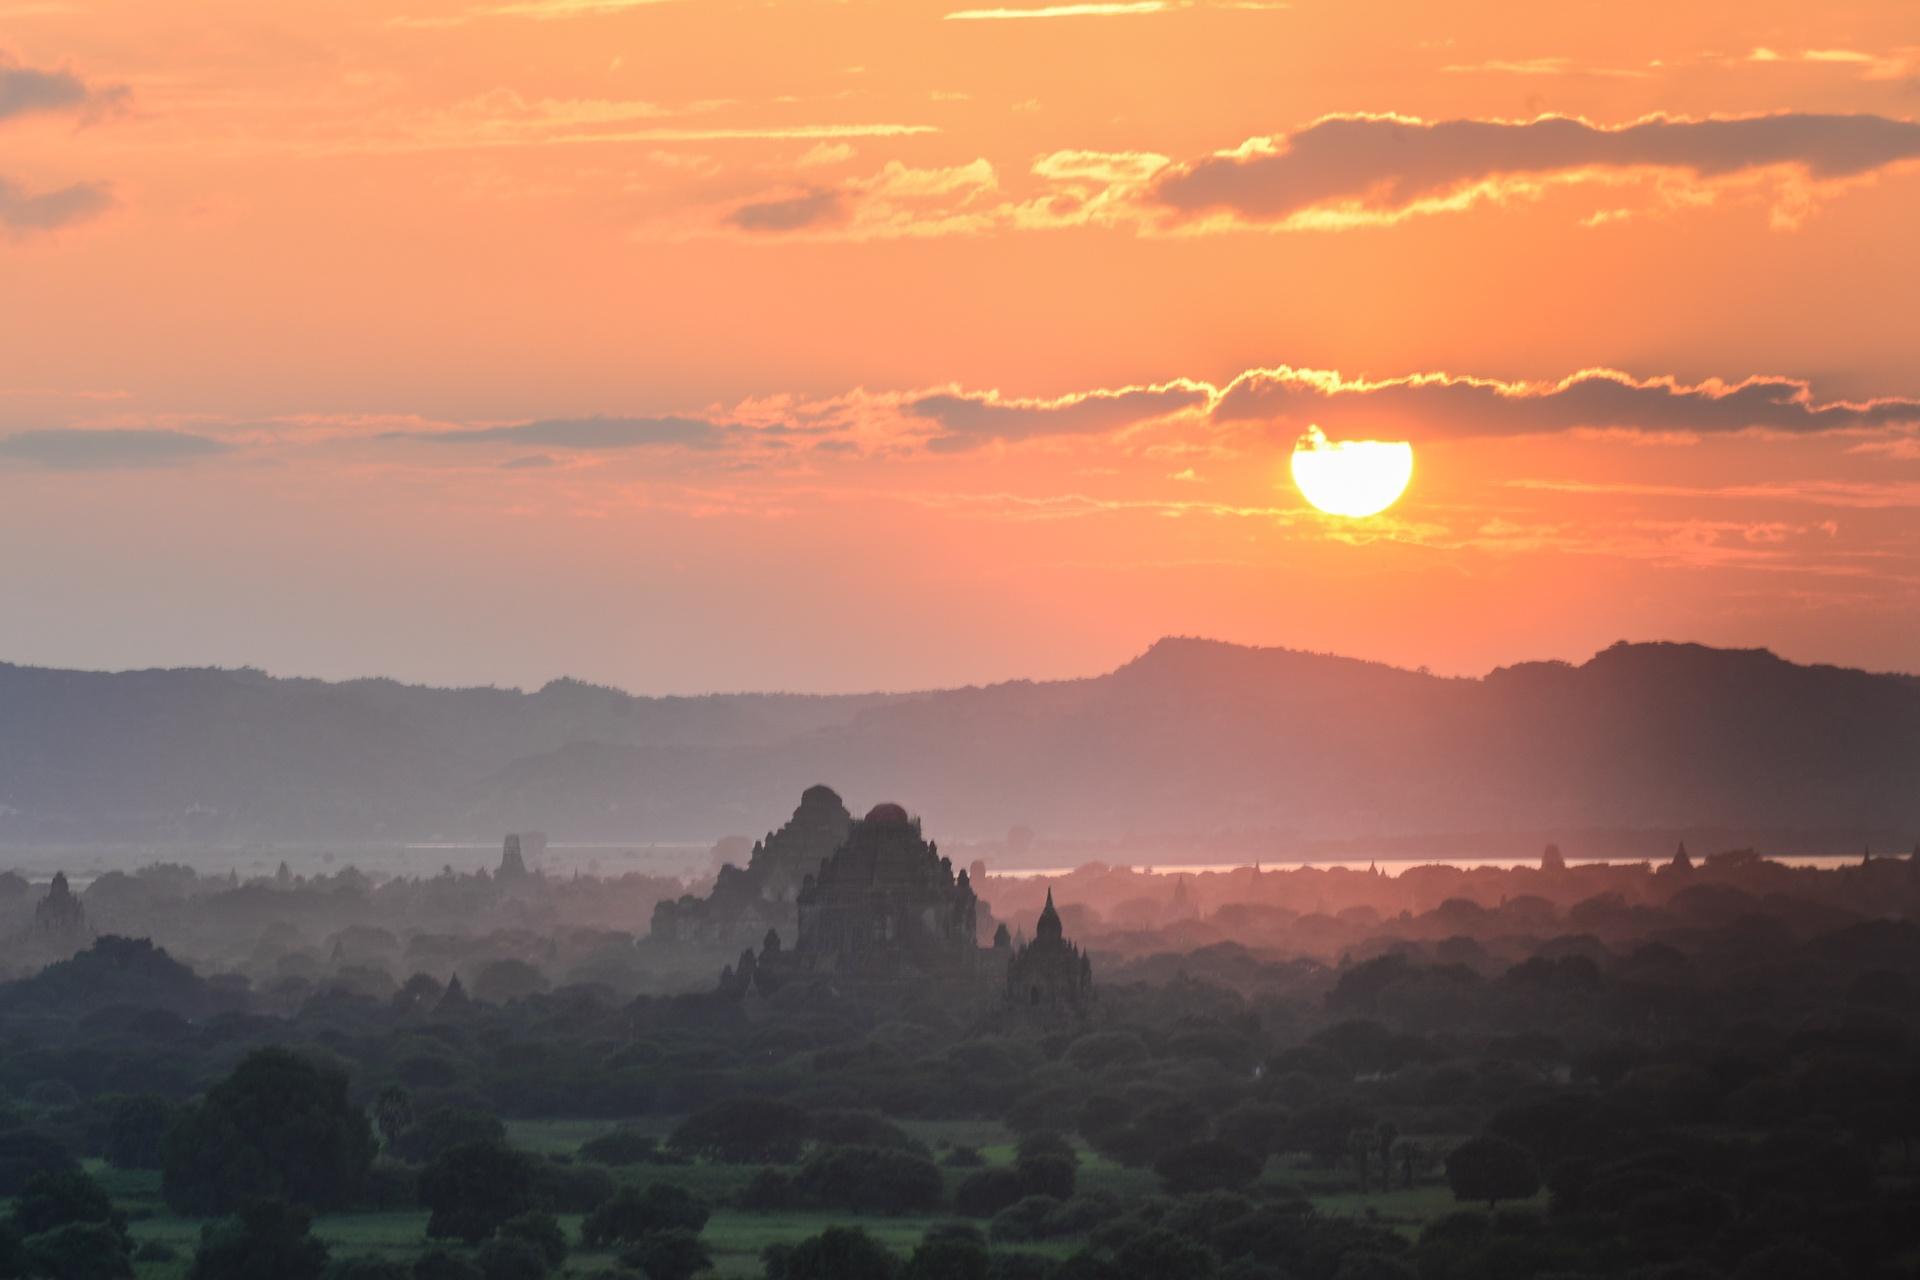 Myanmar - mien dat la ngu quen hinh anh 5